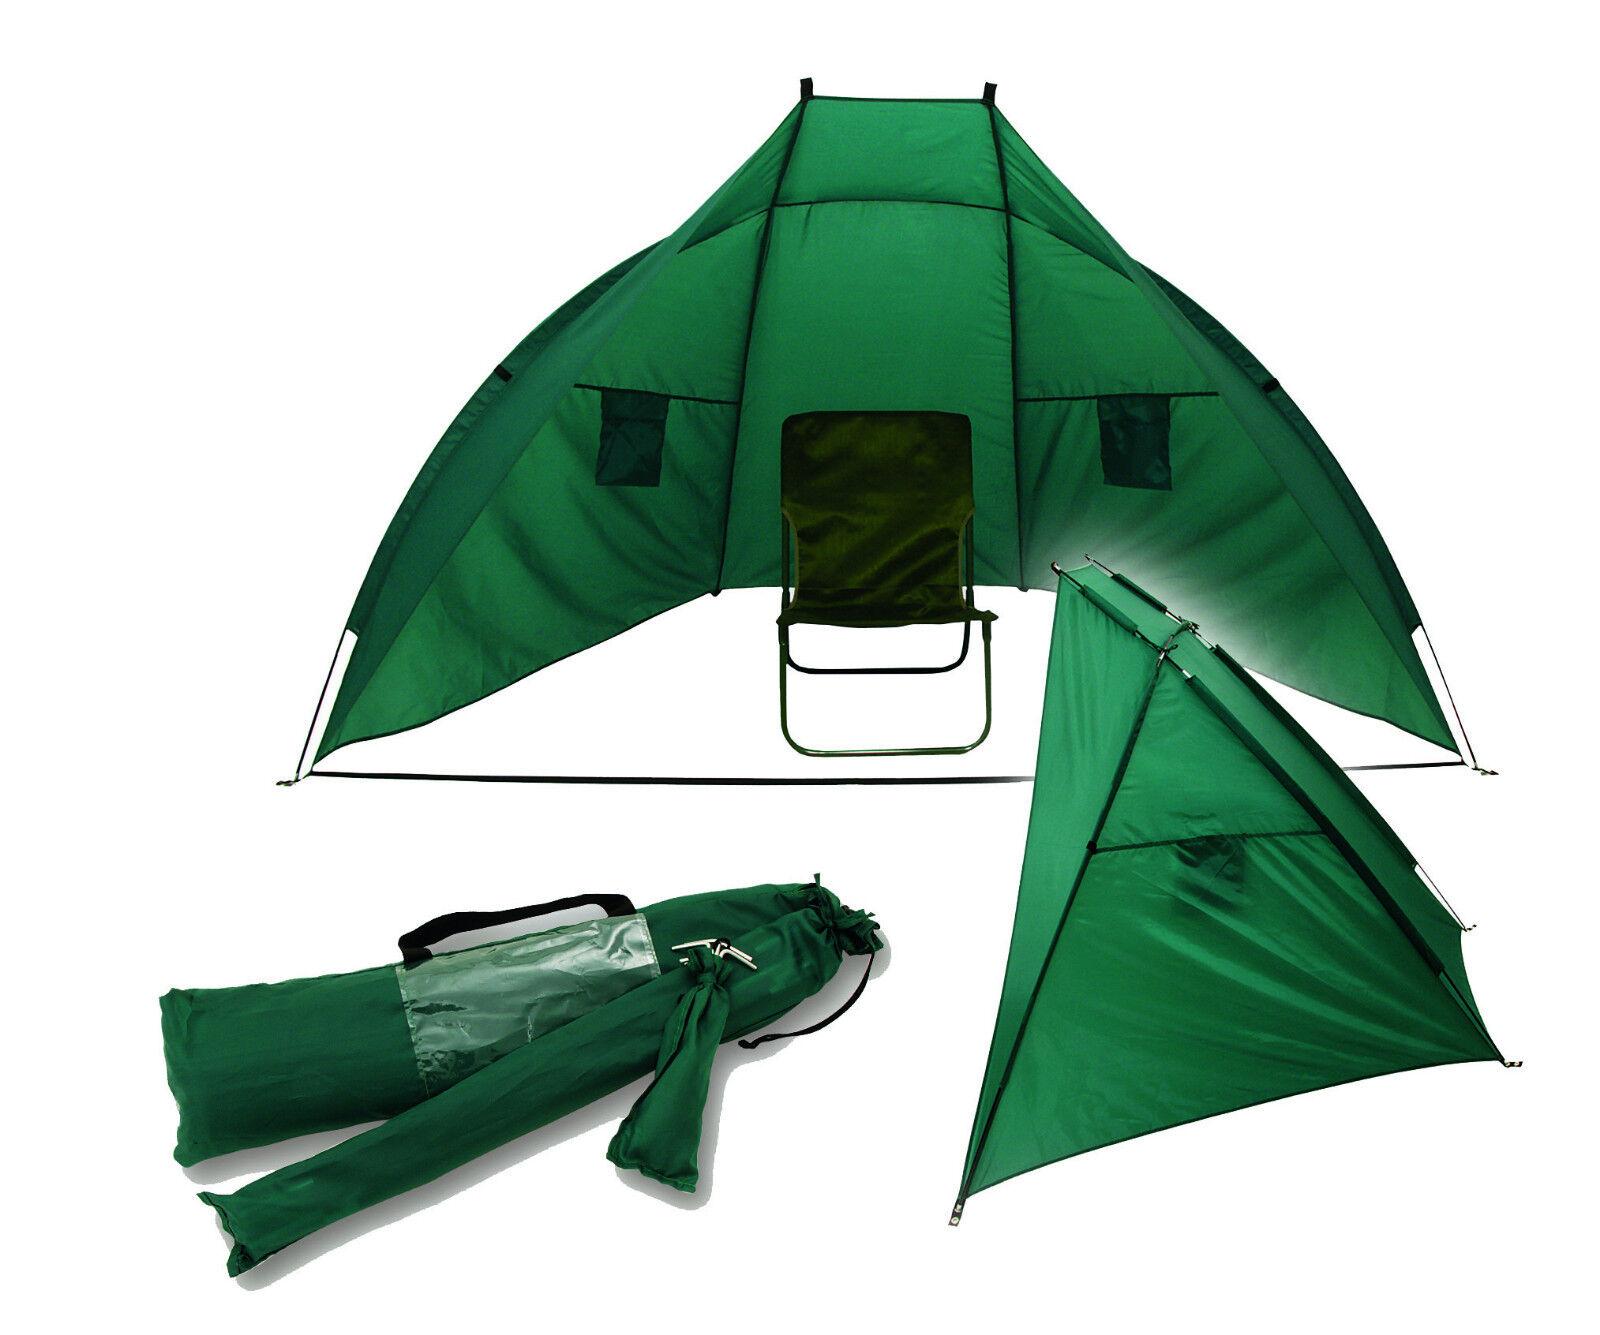 Behr Eco Shelter Angel Zelt Campingzelt Strandmuschel N… |